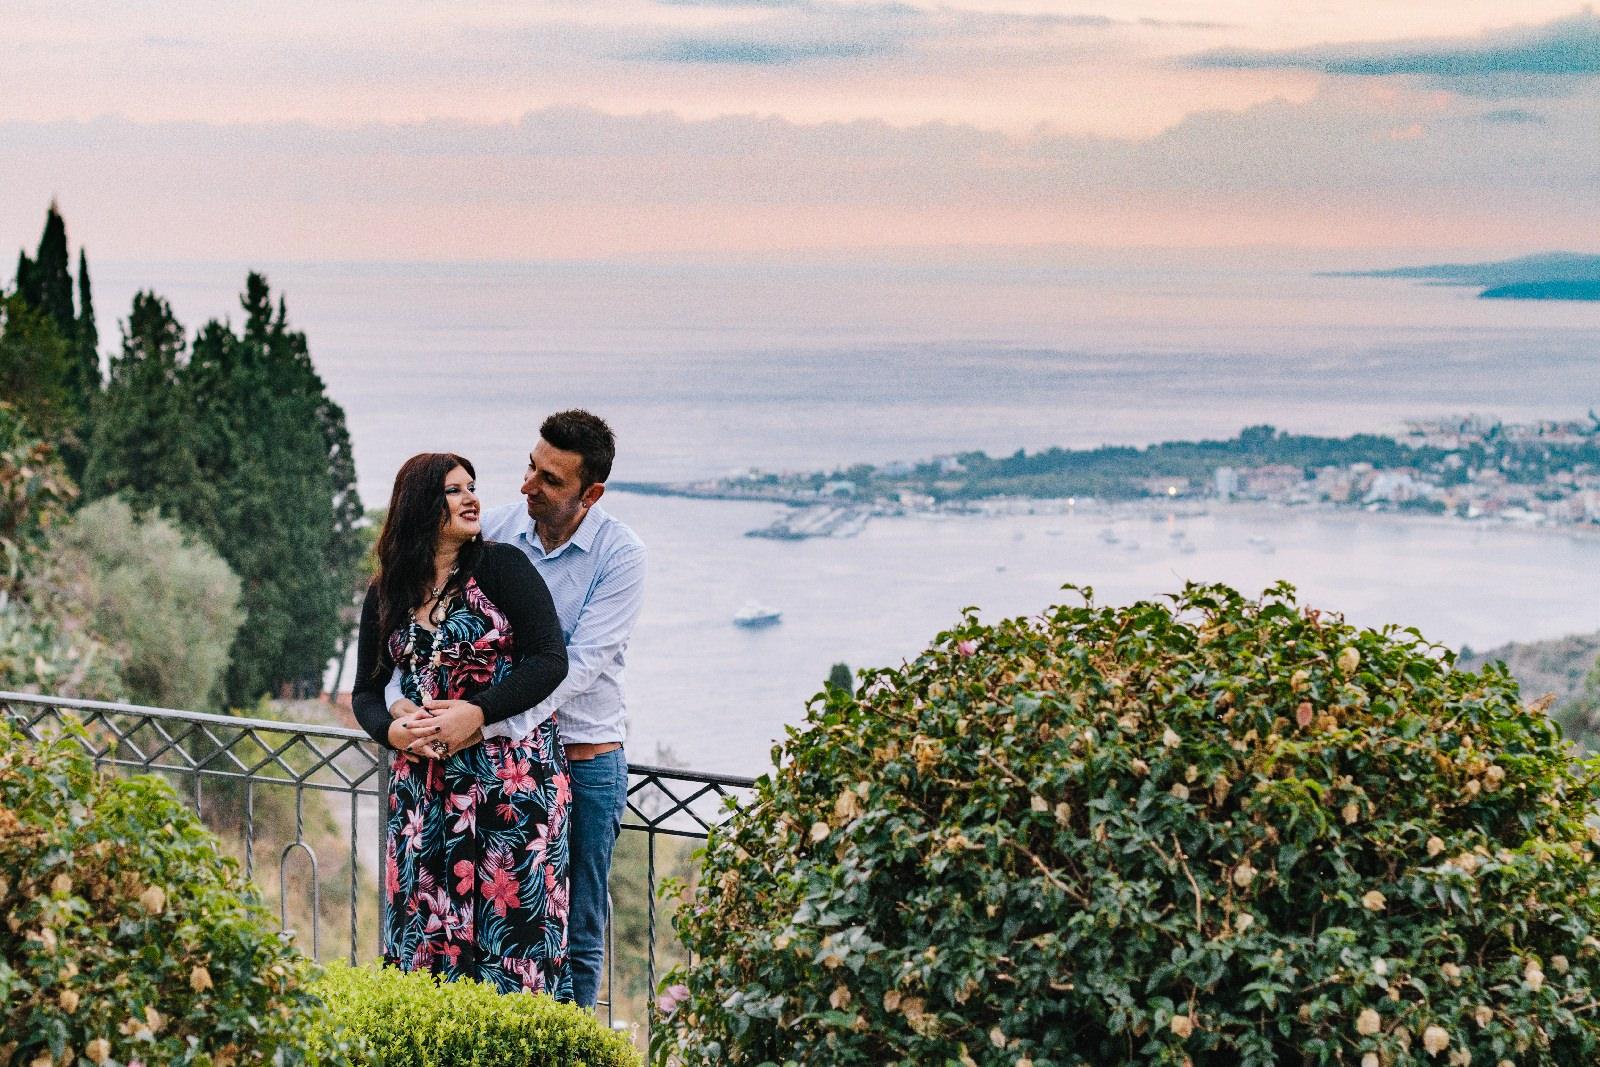 124-2018-09-22-Engagement-Alessandra-e-Igor-Pizzone-142